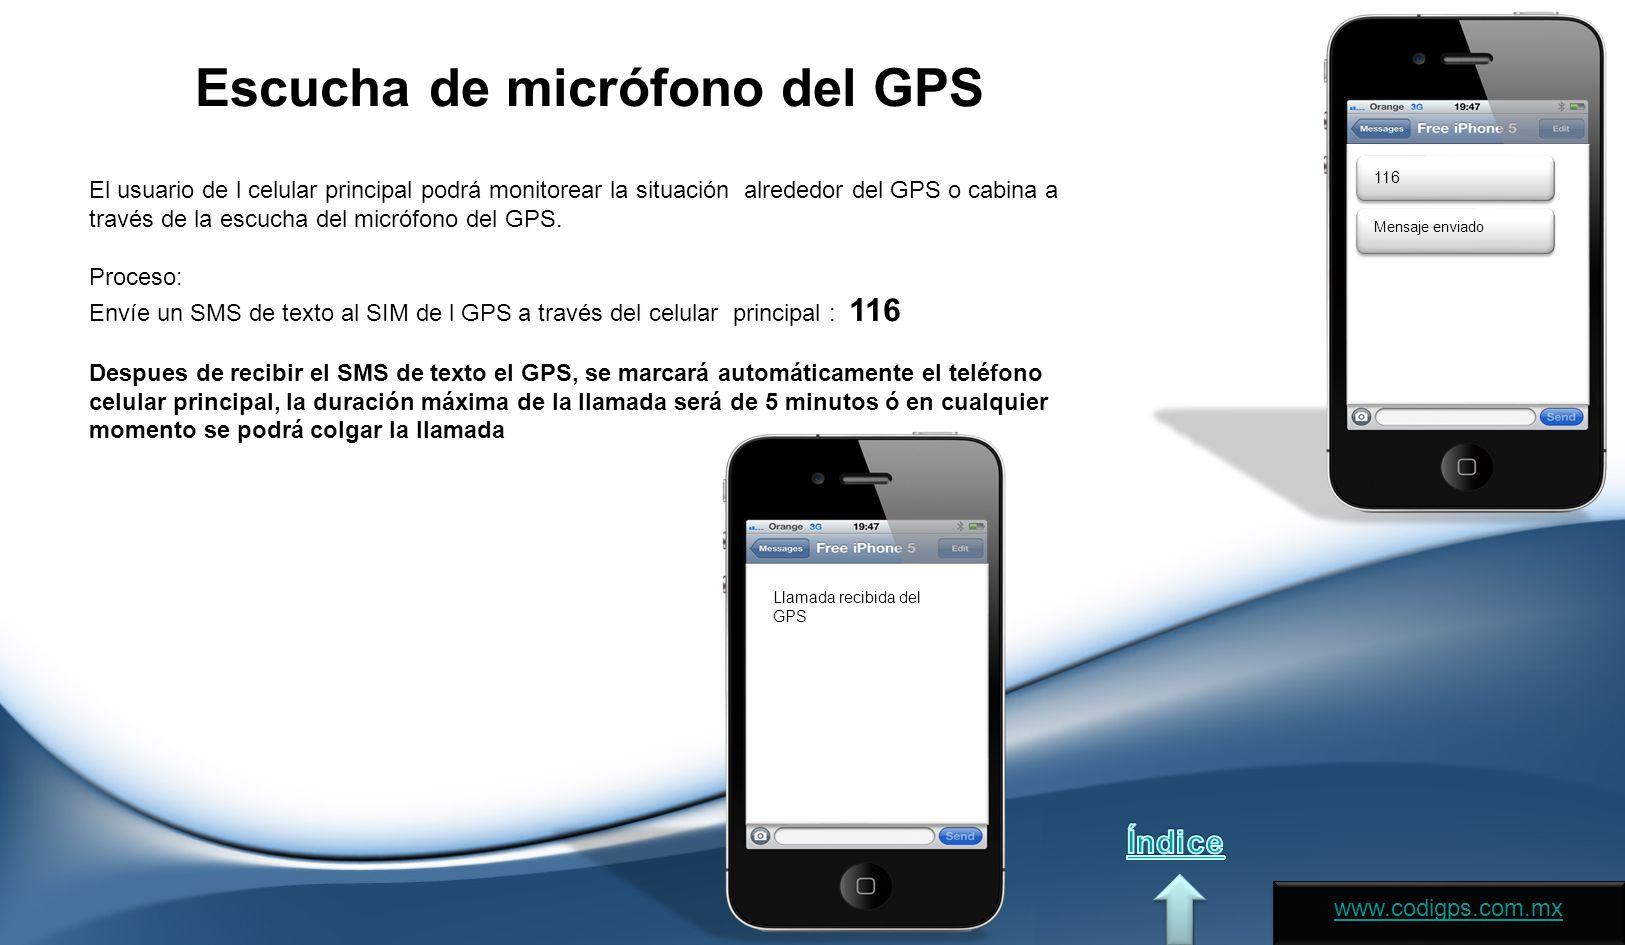 Escucha de micrófono del GPS